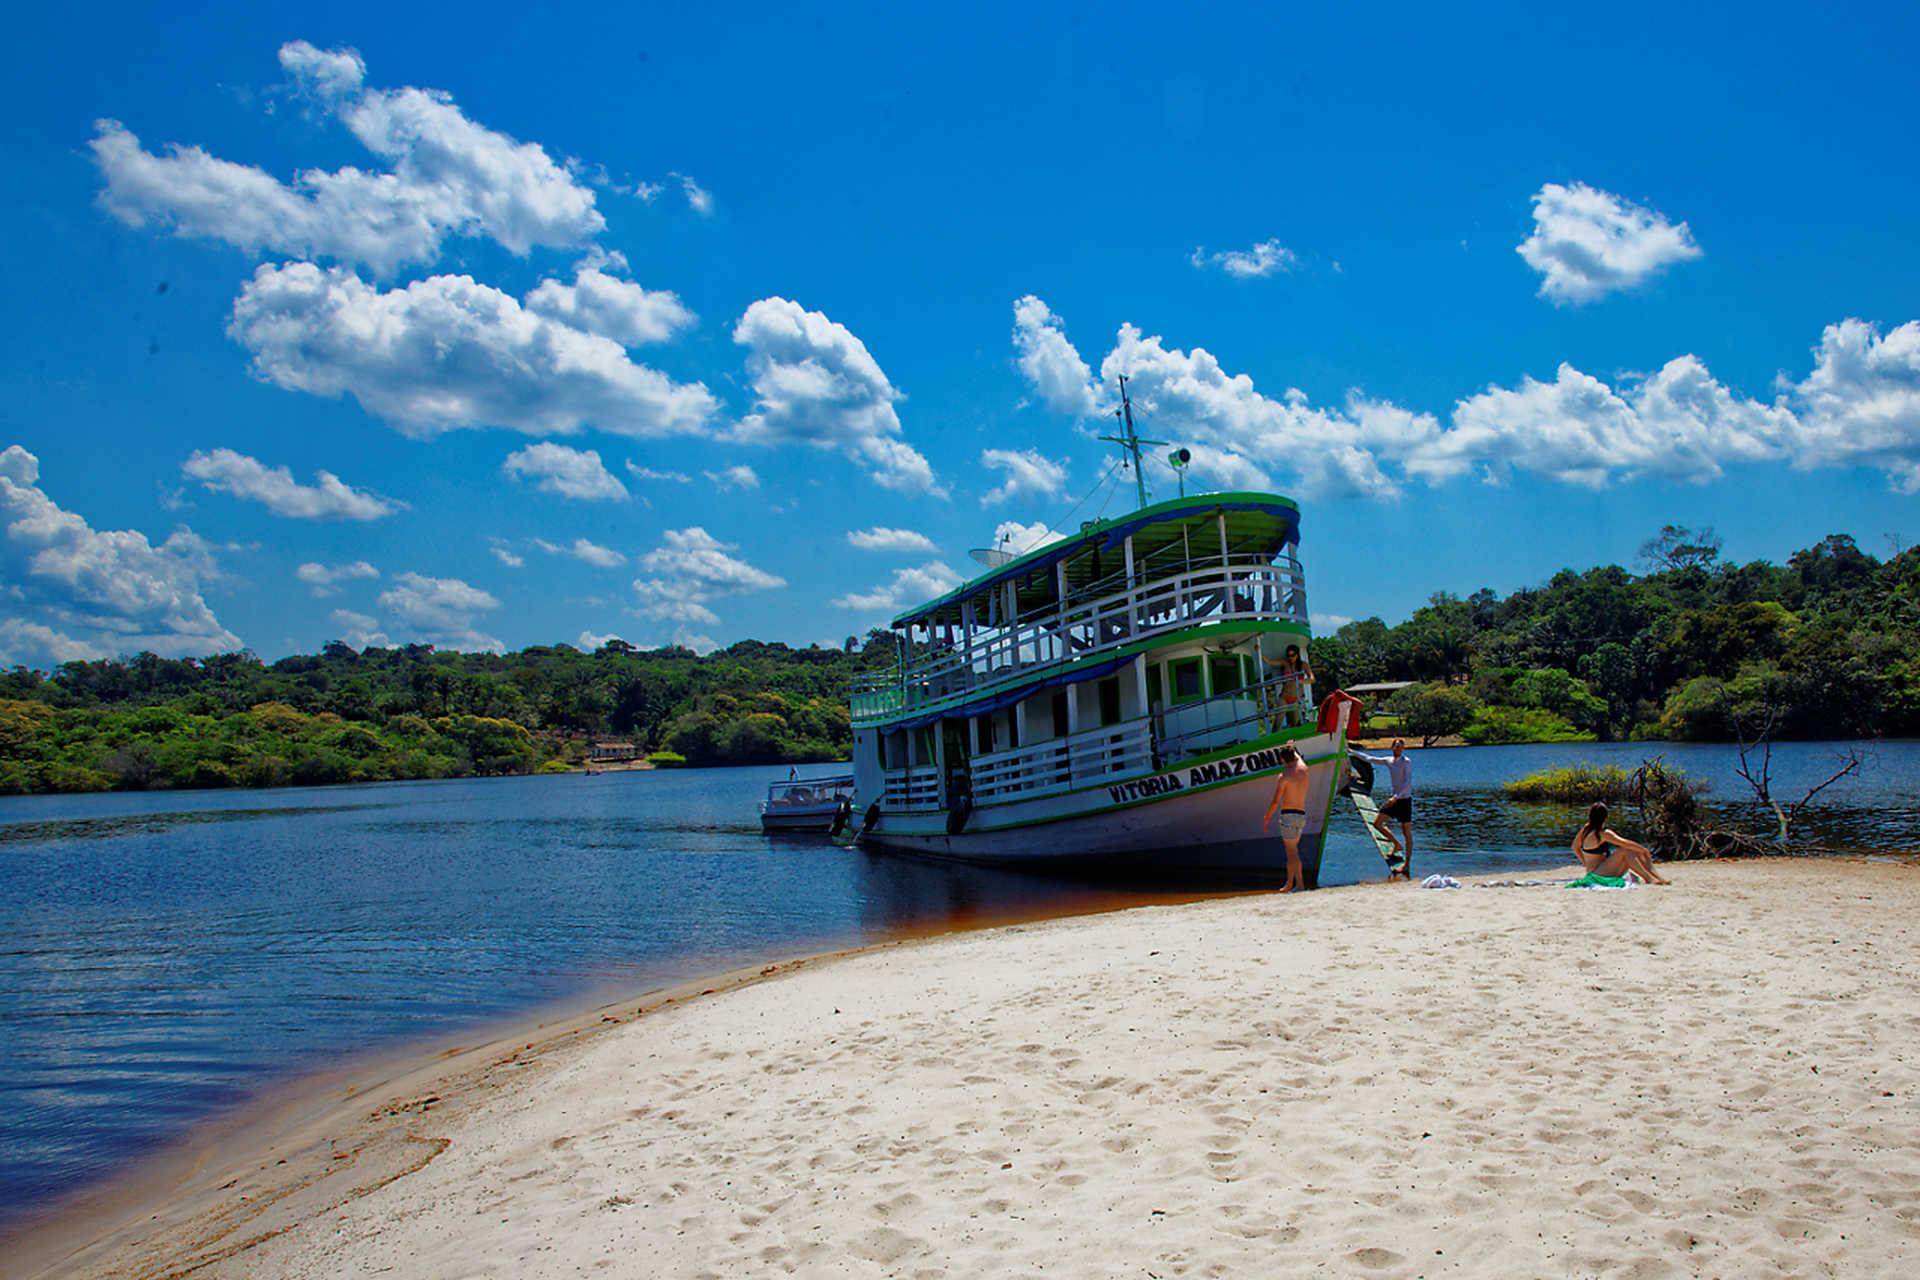 croisière Amazonie, Manaus, Rio de Janeiro, Ilha Grande